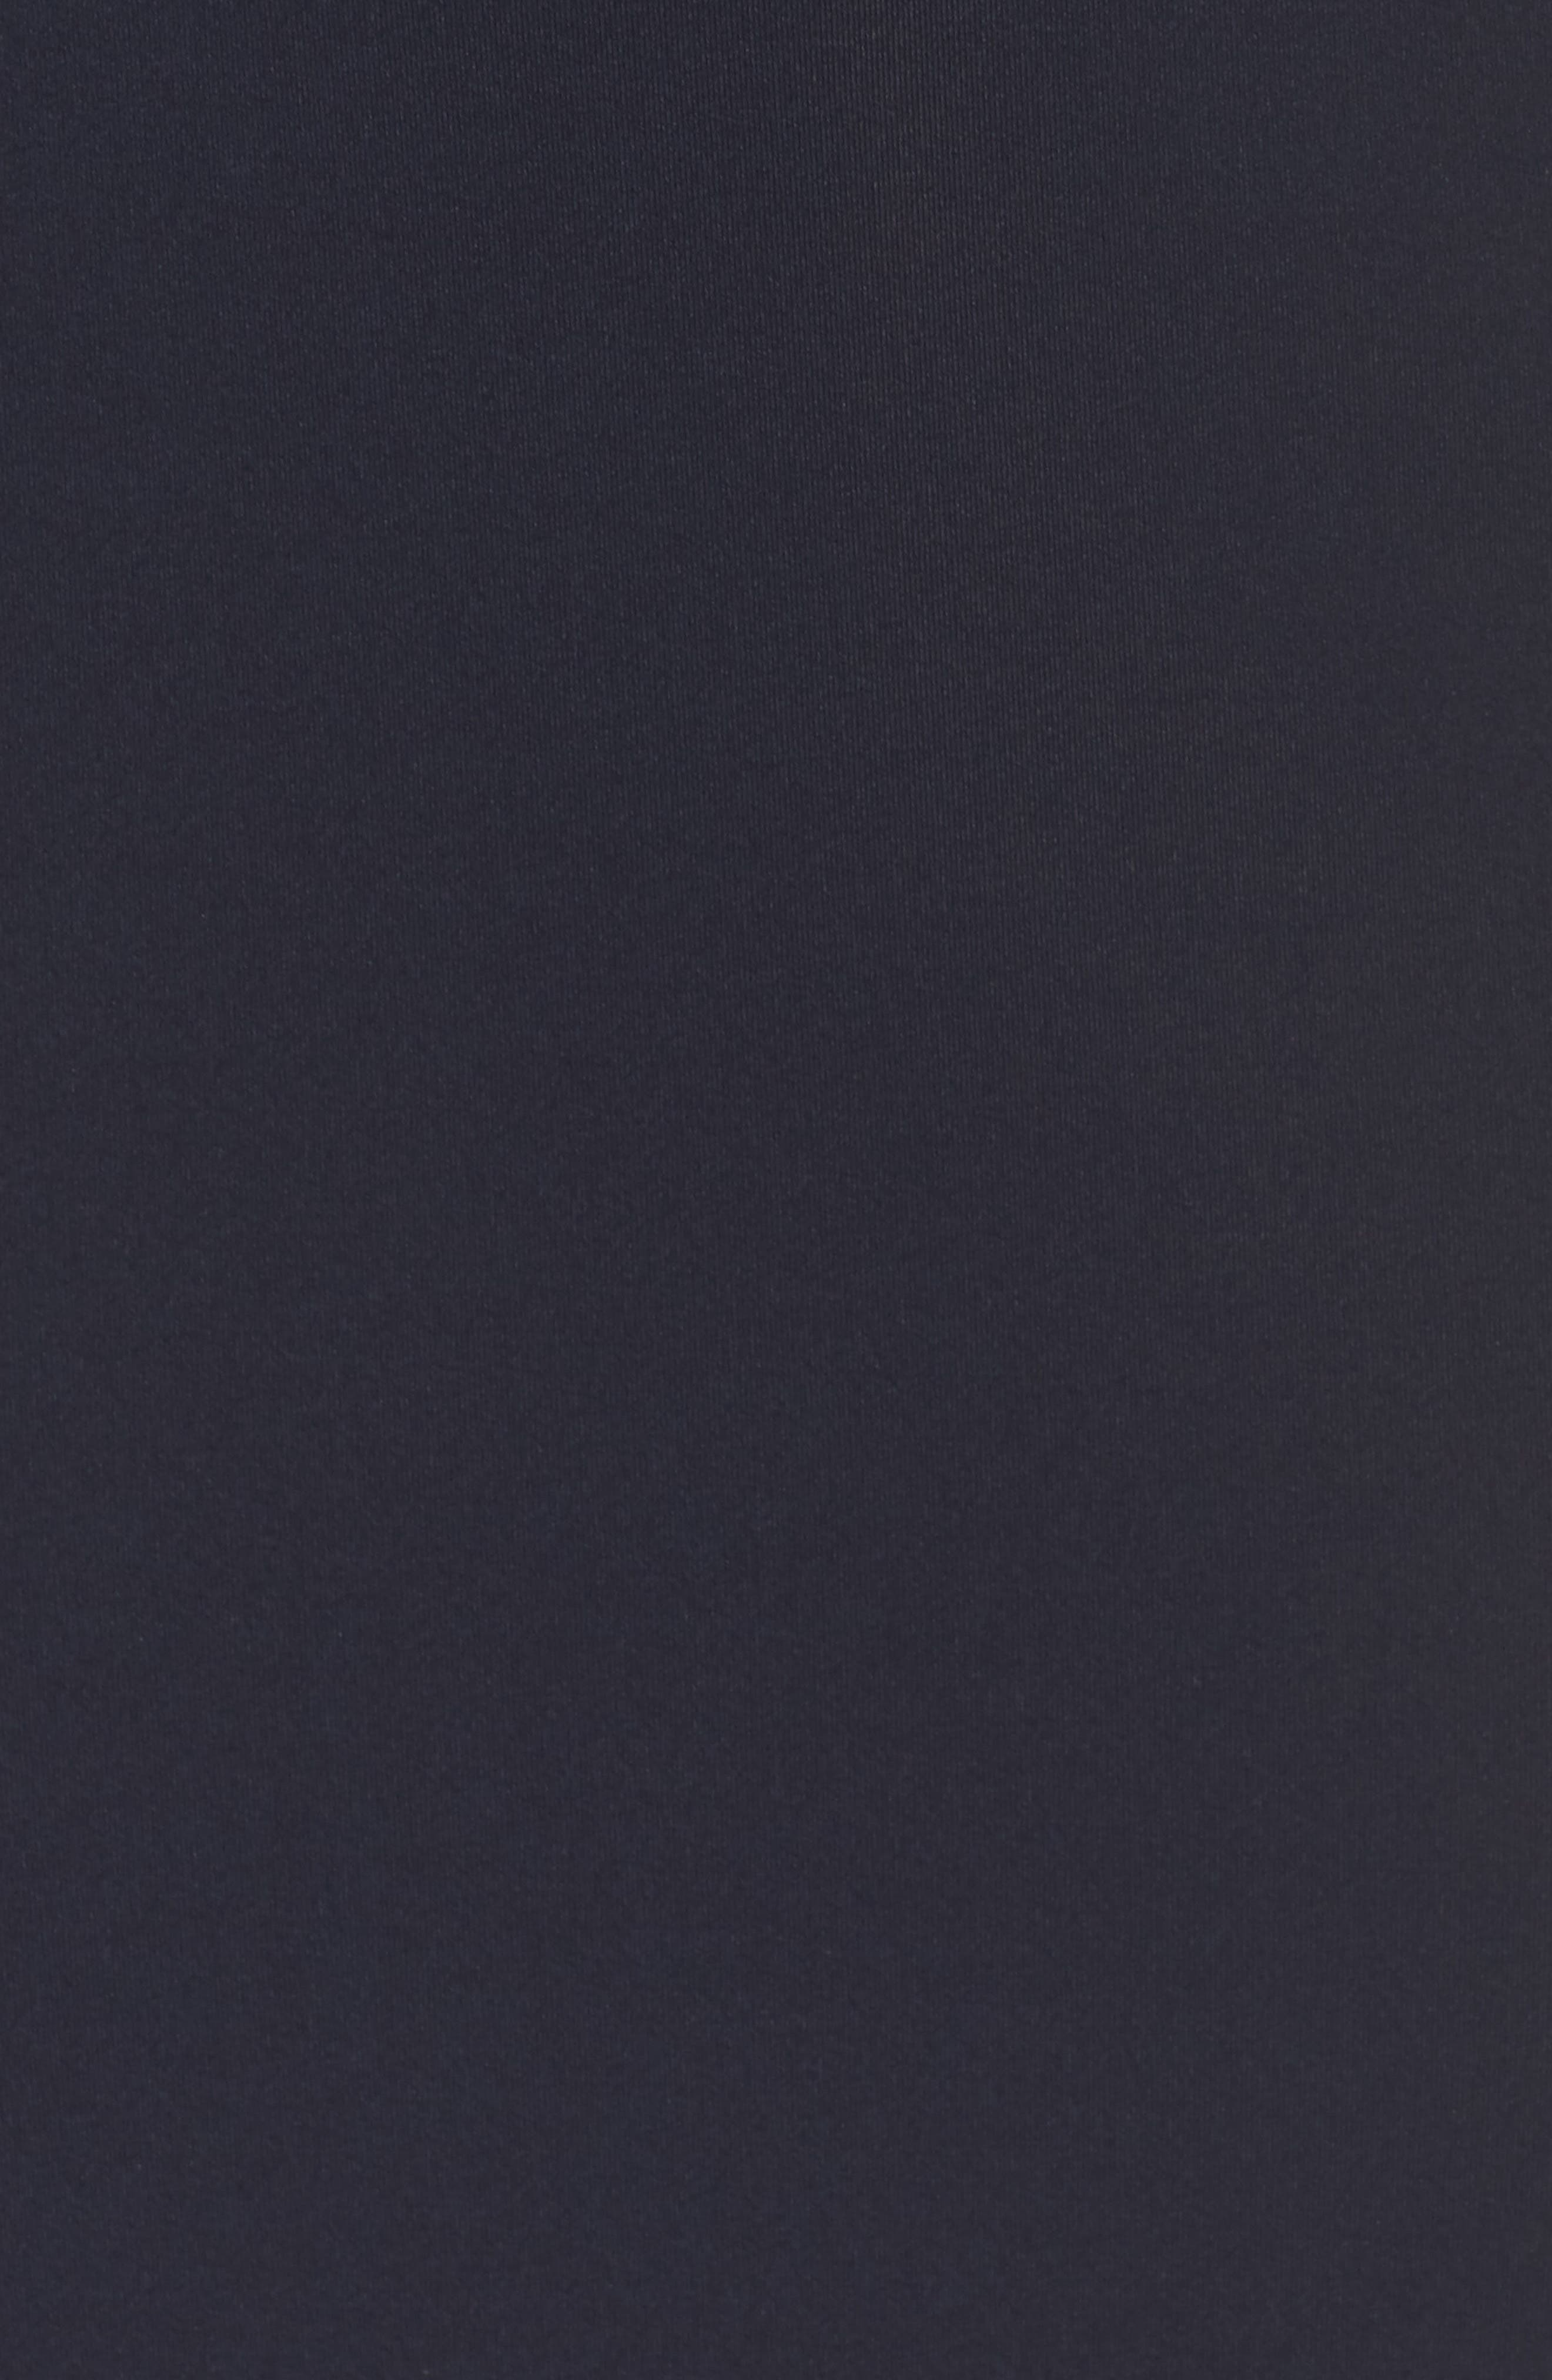 Fringe Sheath Dress,                             Alternate thumbnail 6, color,                             NAVY